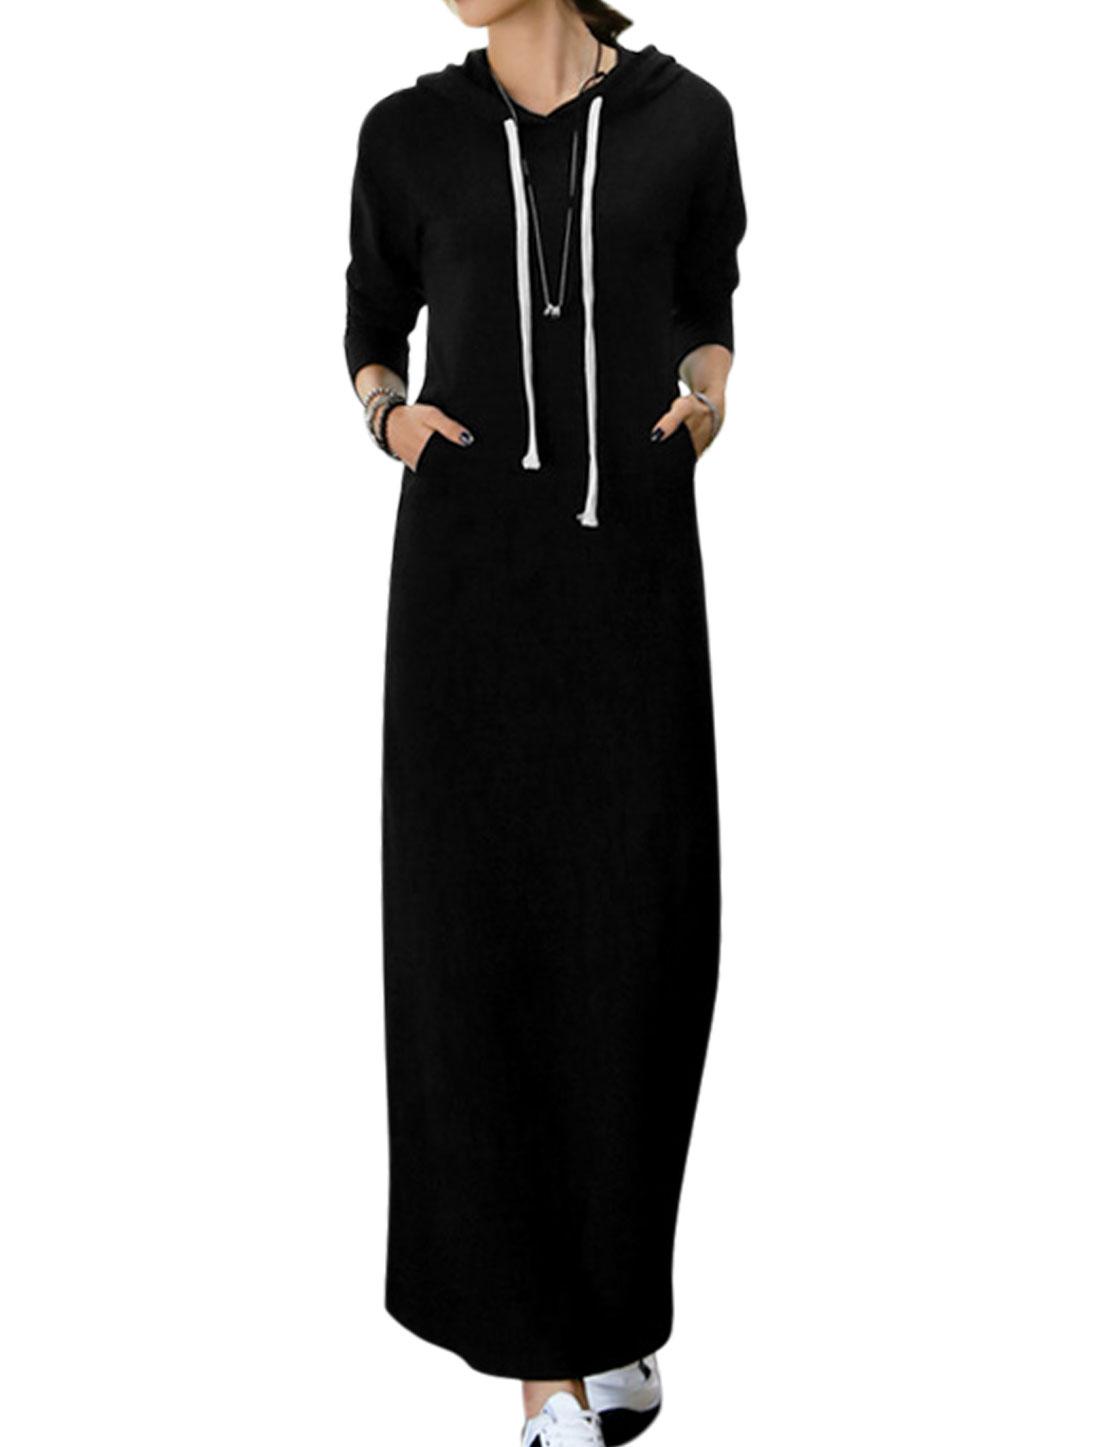 Women Drawtring Hood Kangaroo Pocket Long Sleeves Sweatshirt Dress Black S